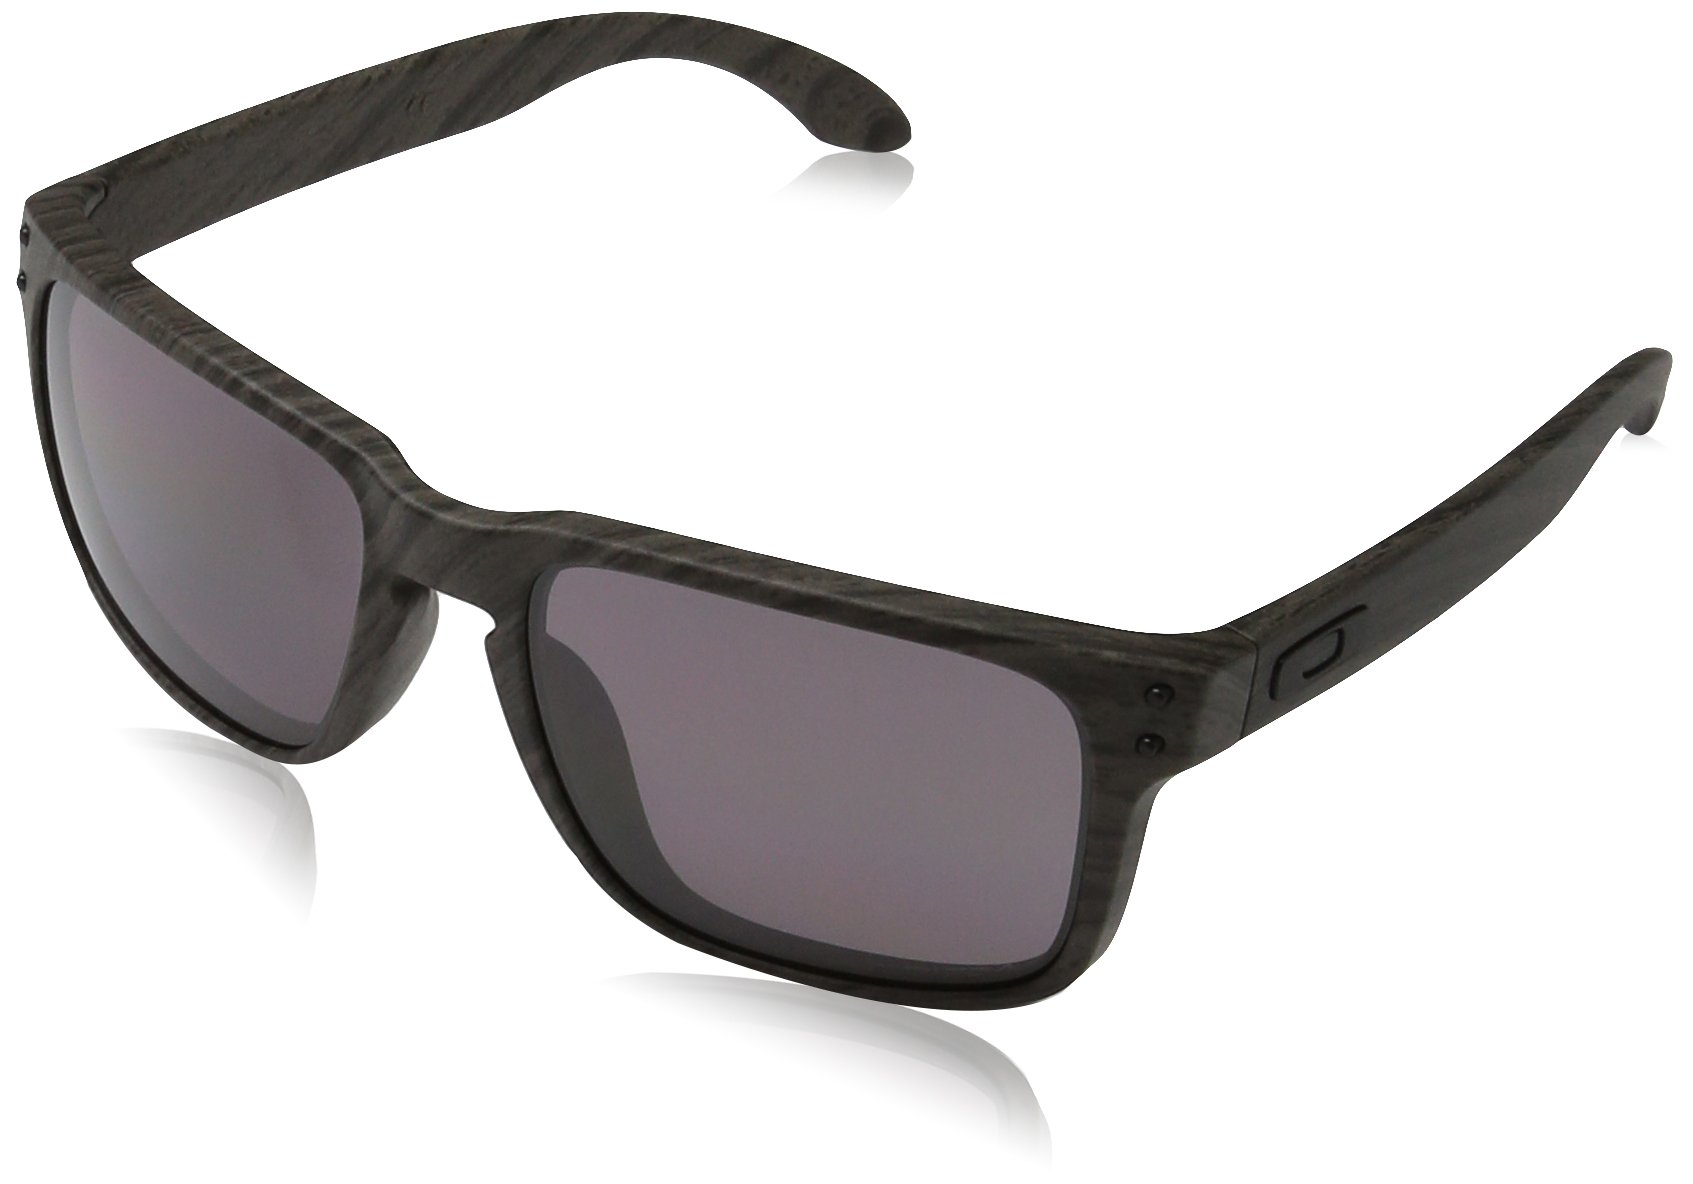 90415072434 Details about Oakley Shaun White Signature Series Holbrook Sunglasses .